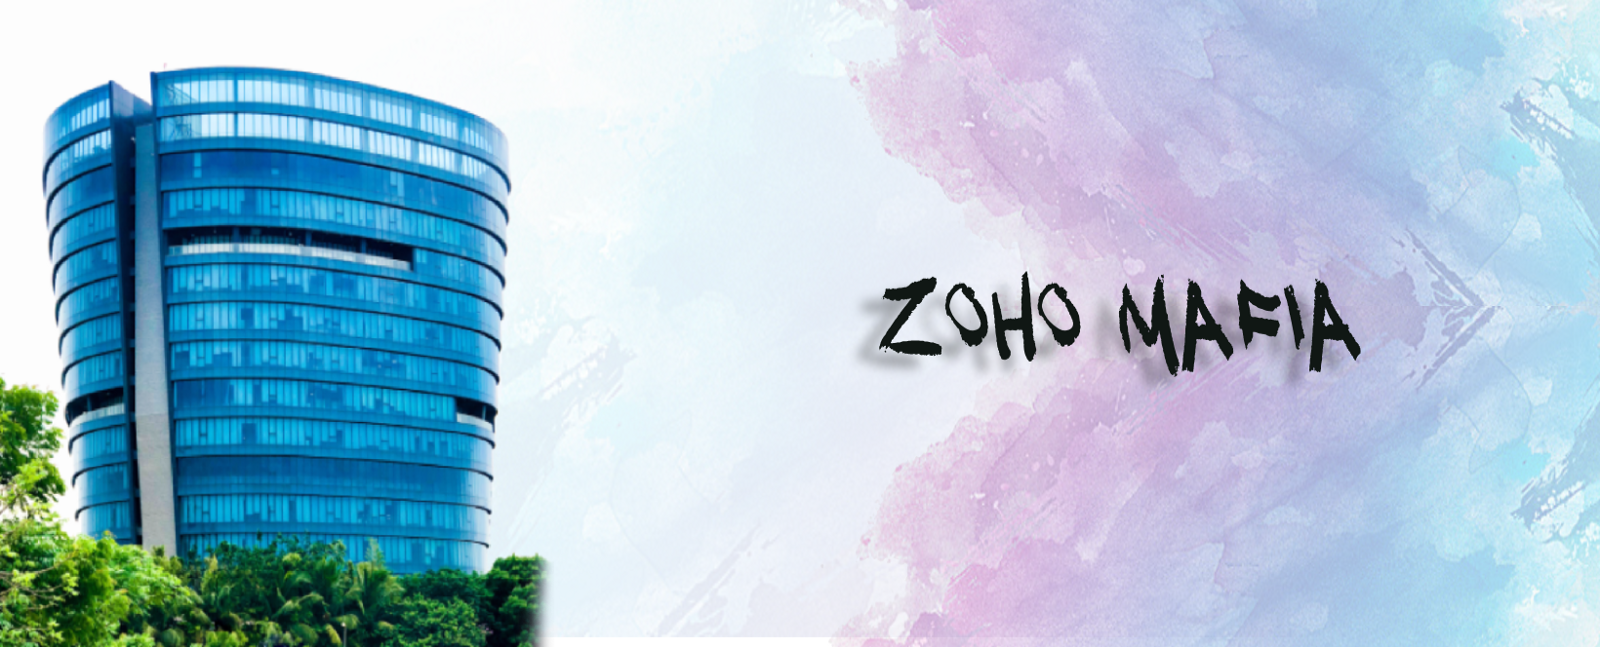 /zoho-mafia-16-companies-founded-by-former-zoho-employees-eafac85ff2ea feature image